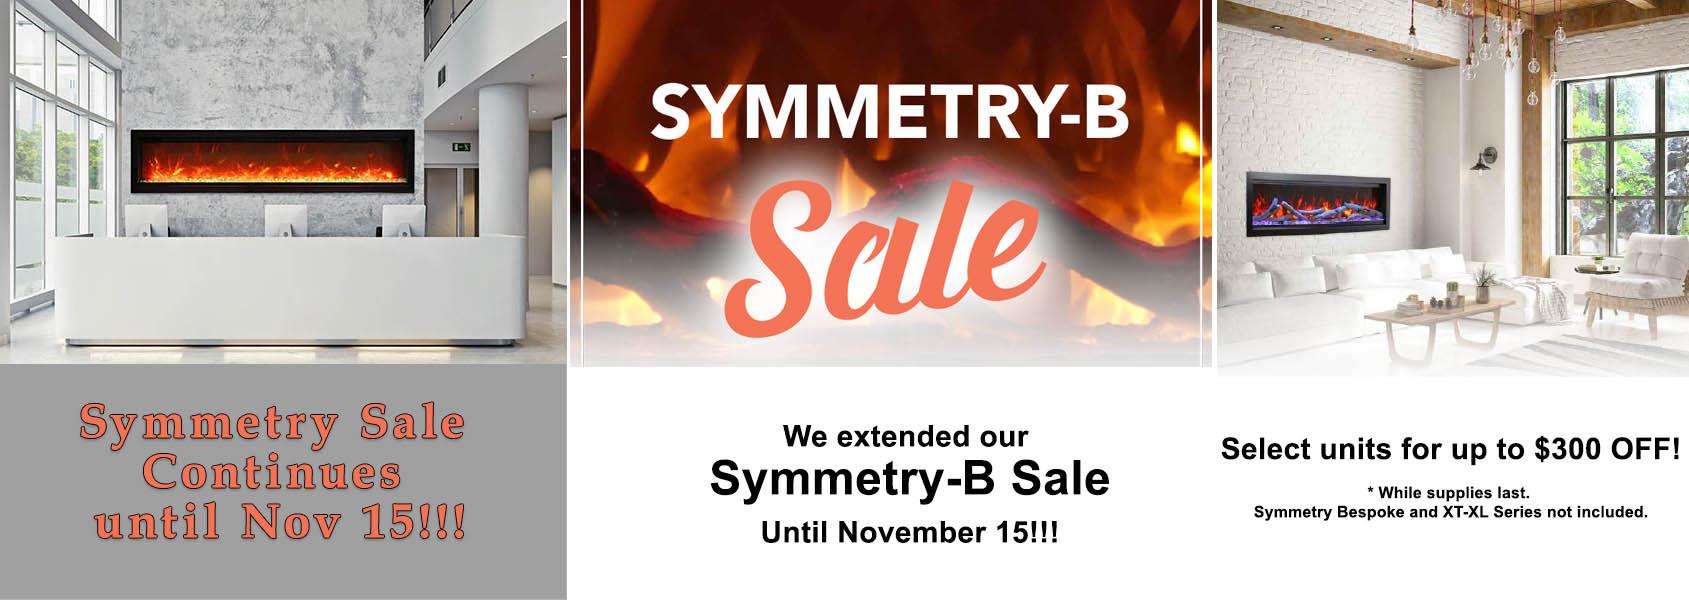 Symmetry sale